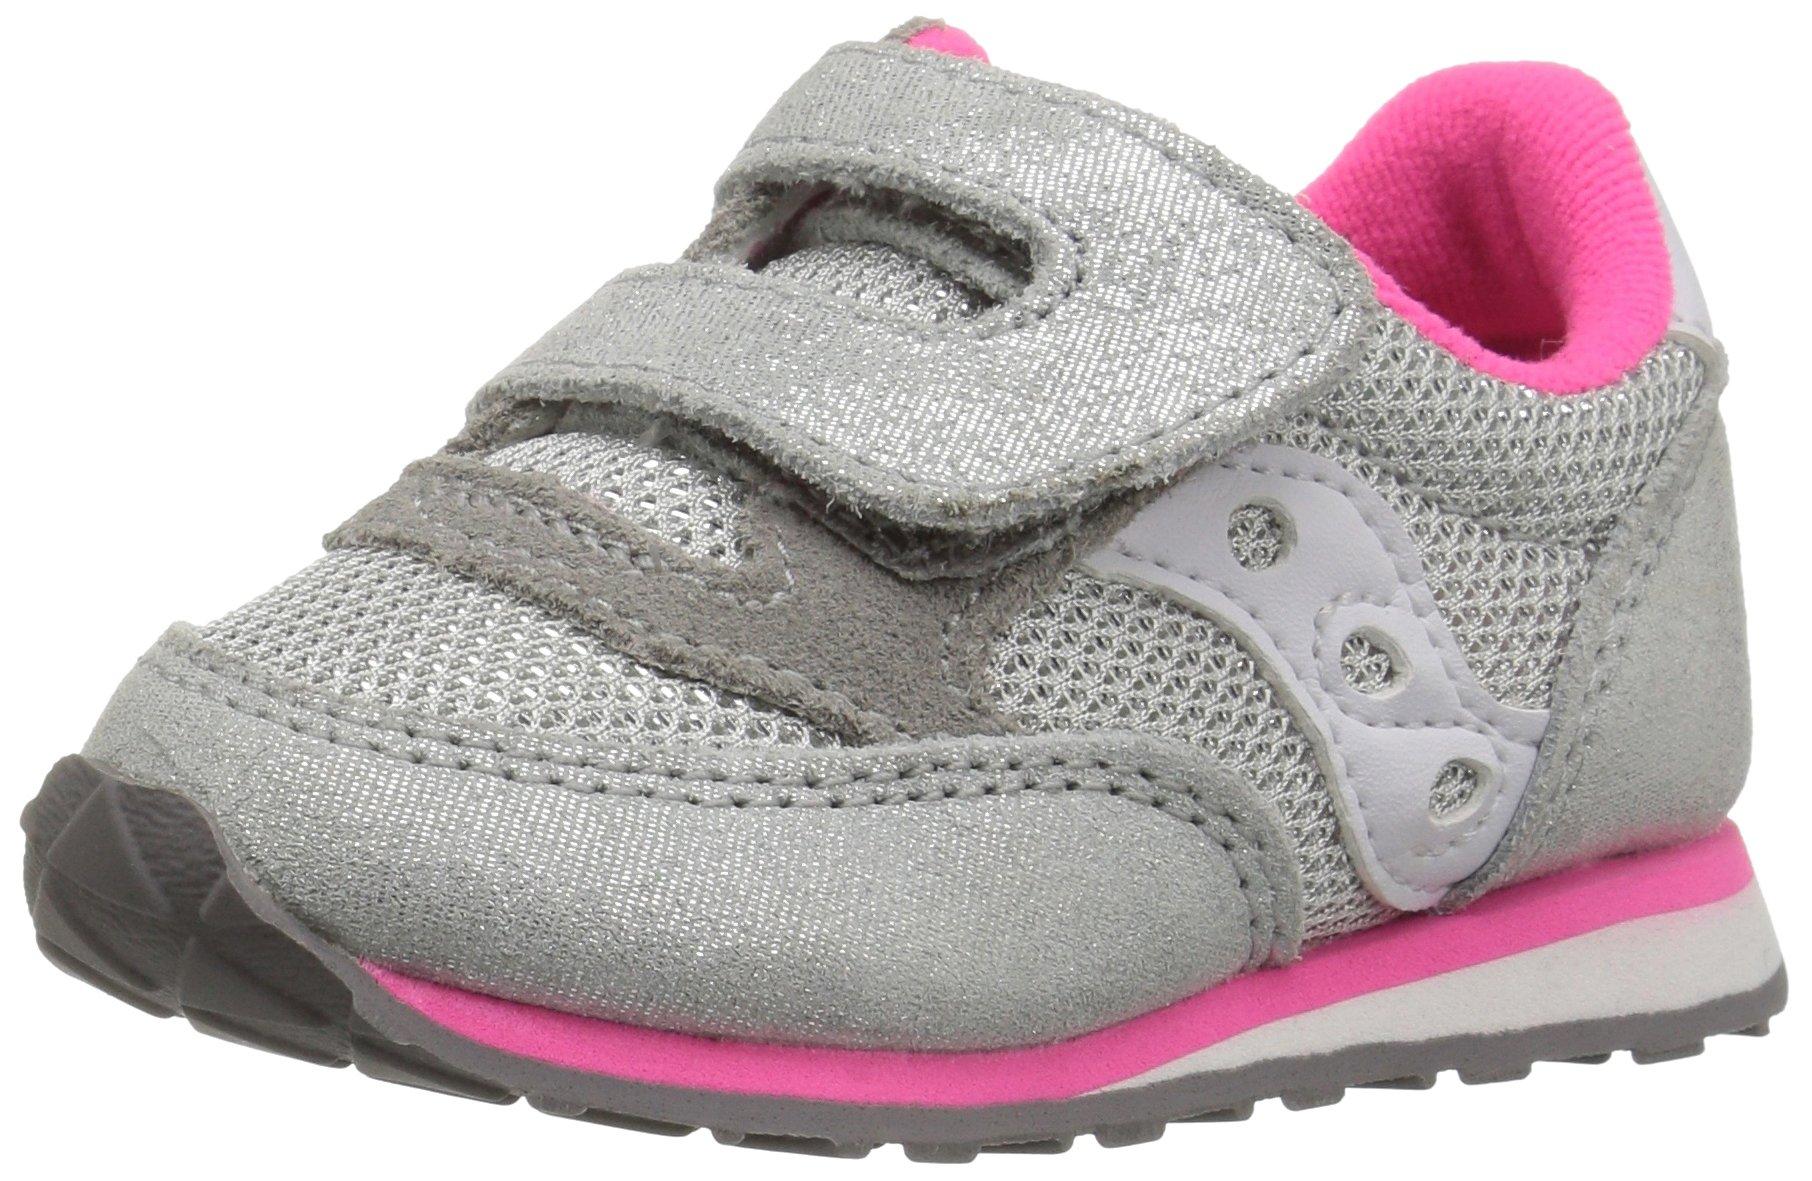 Saucony Jazz Hook & Loop Sneaker (Toddler/Little Kid), Silver/Pink, 10 M US Toddler